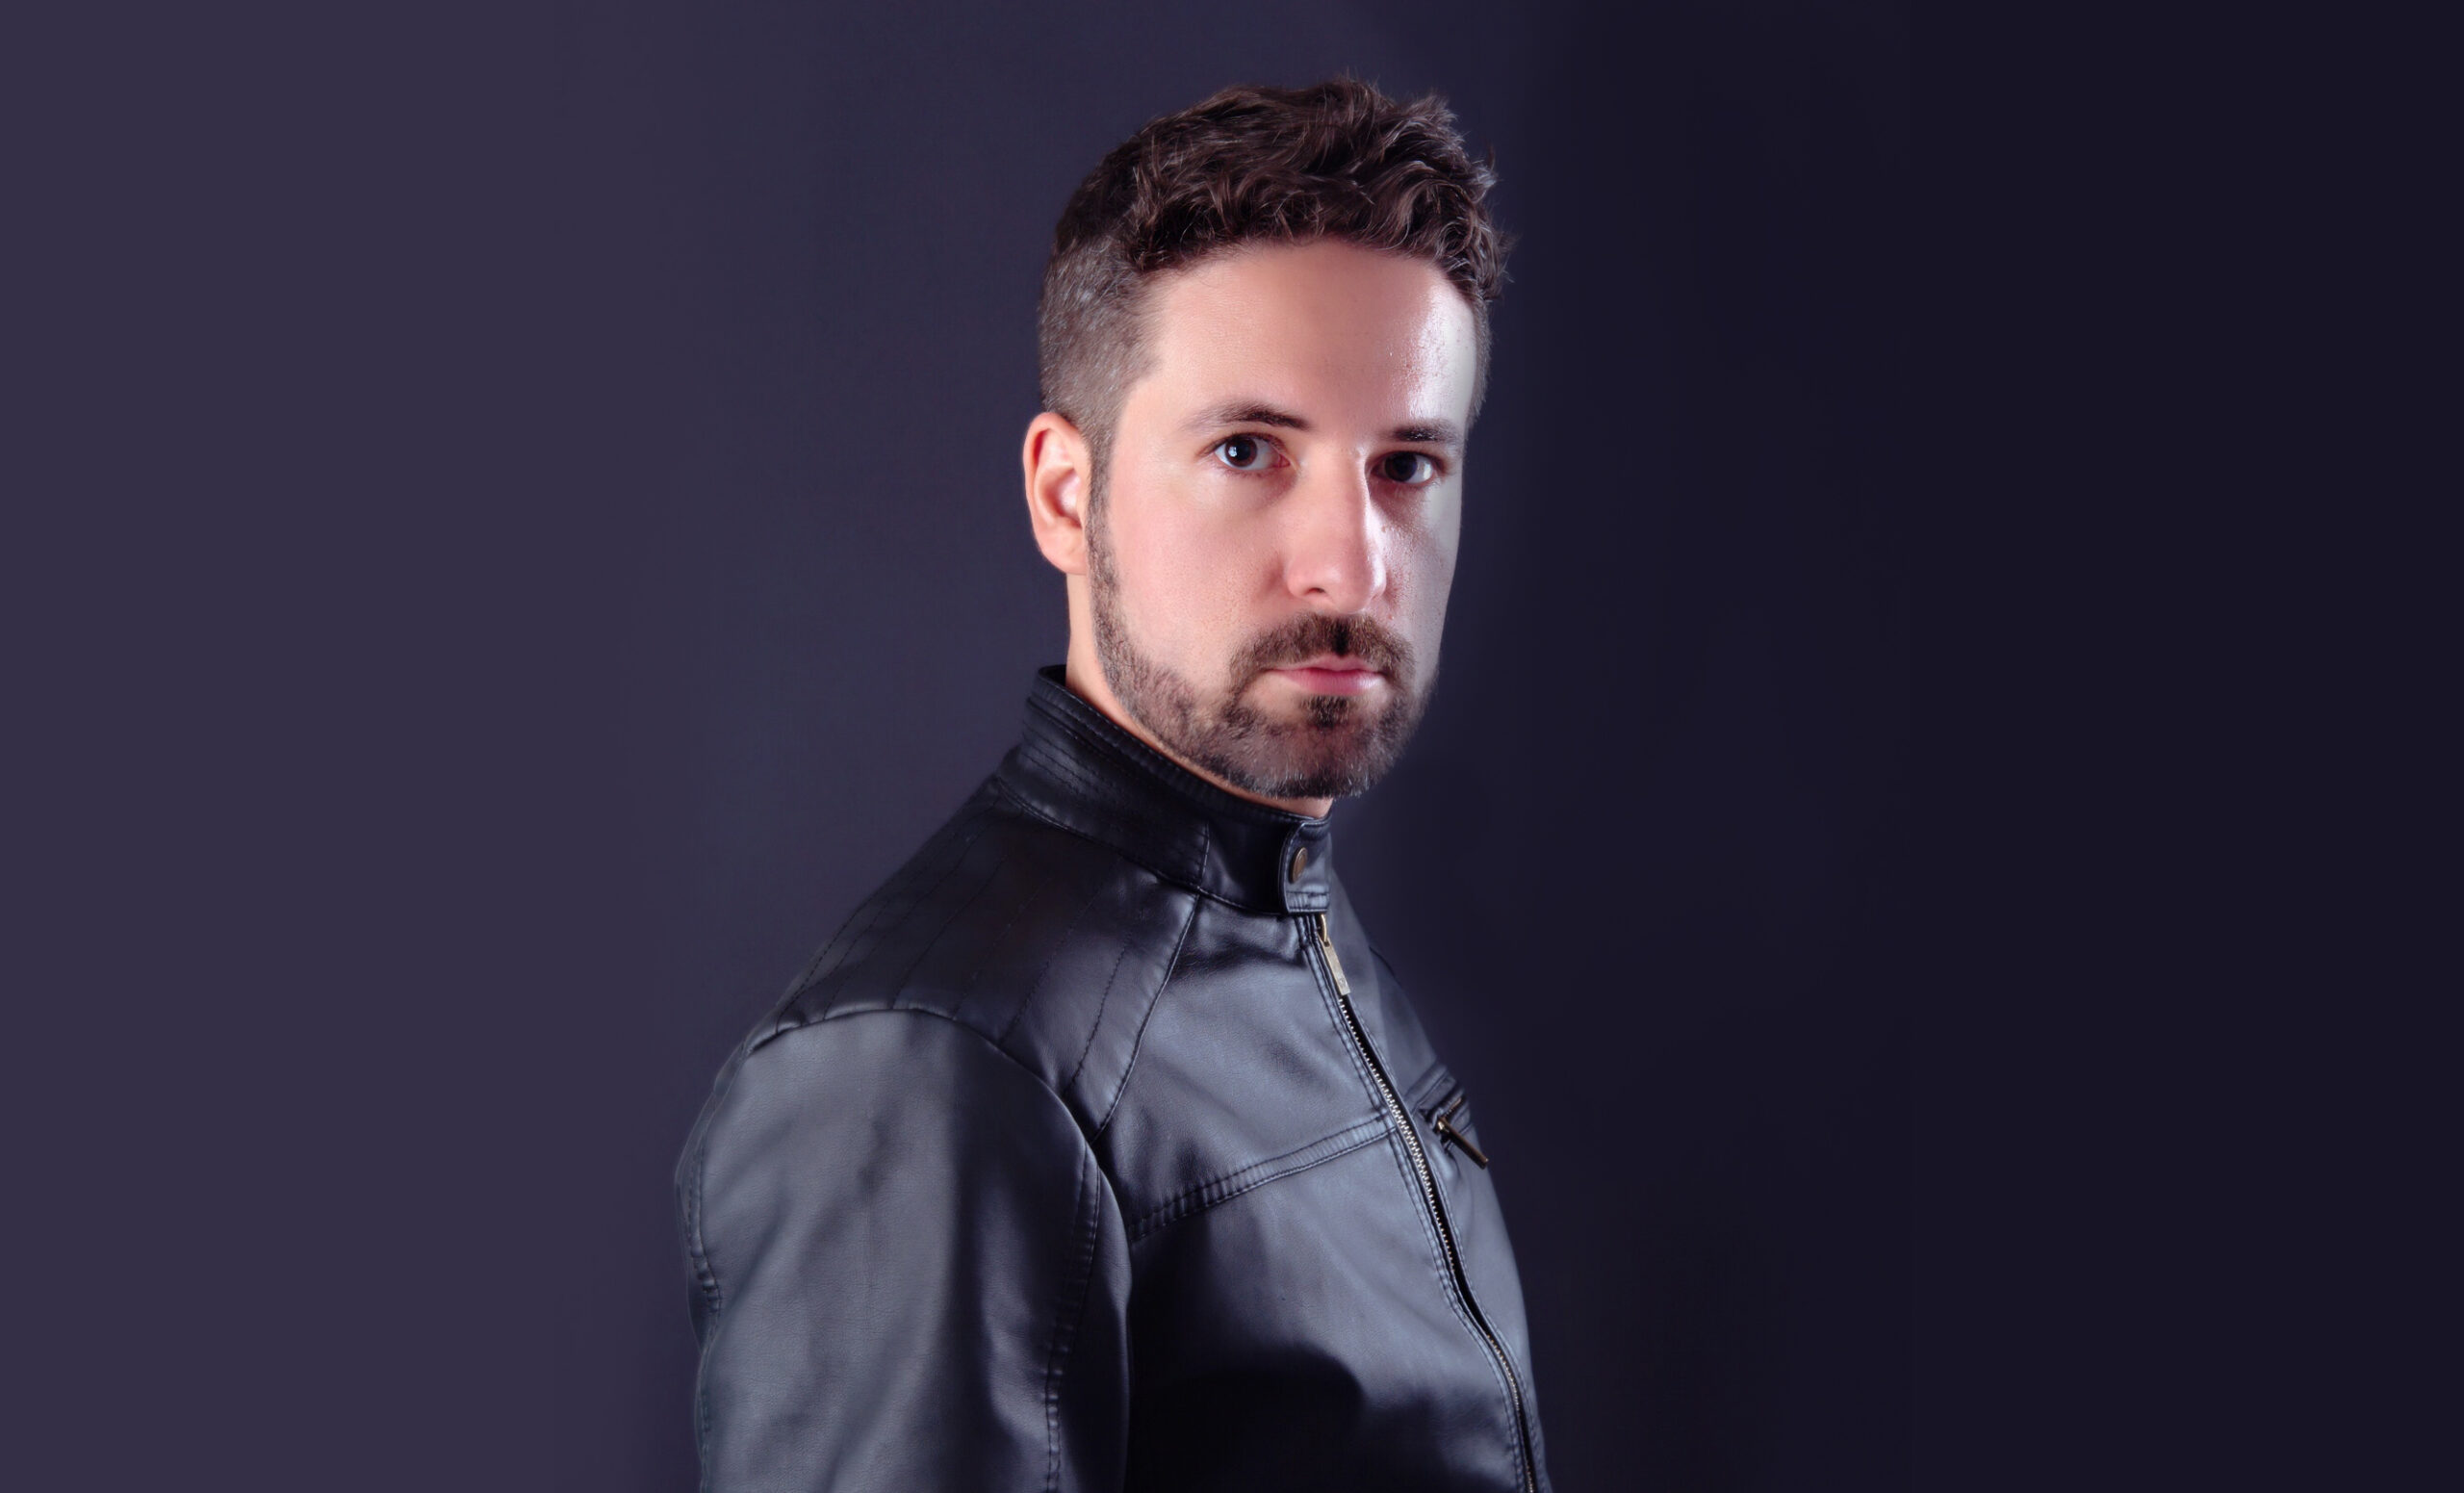 vibez indica entrevista dj produtor vallent scaled